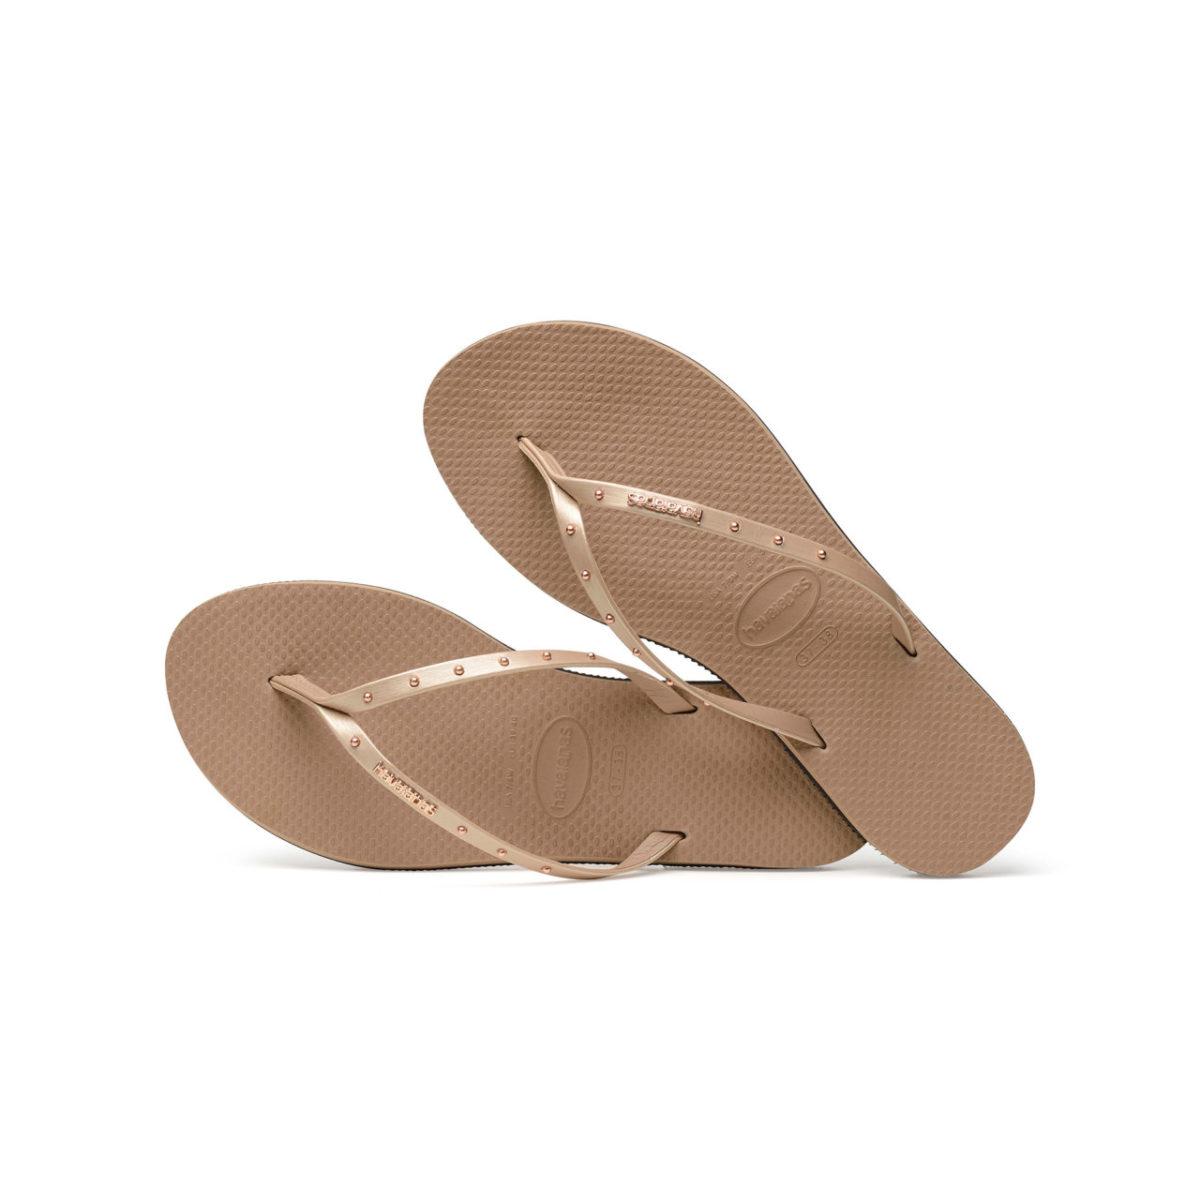 Havaianas Flipflops Sandale Badeschuh Zehentrenner You Maxi Rose Gold Badelatschen Badeschlappen